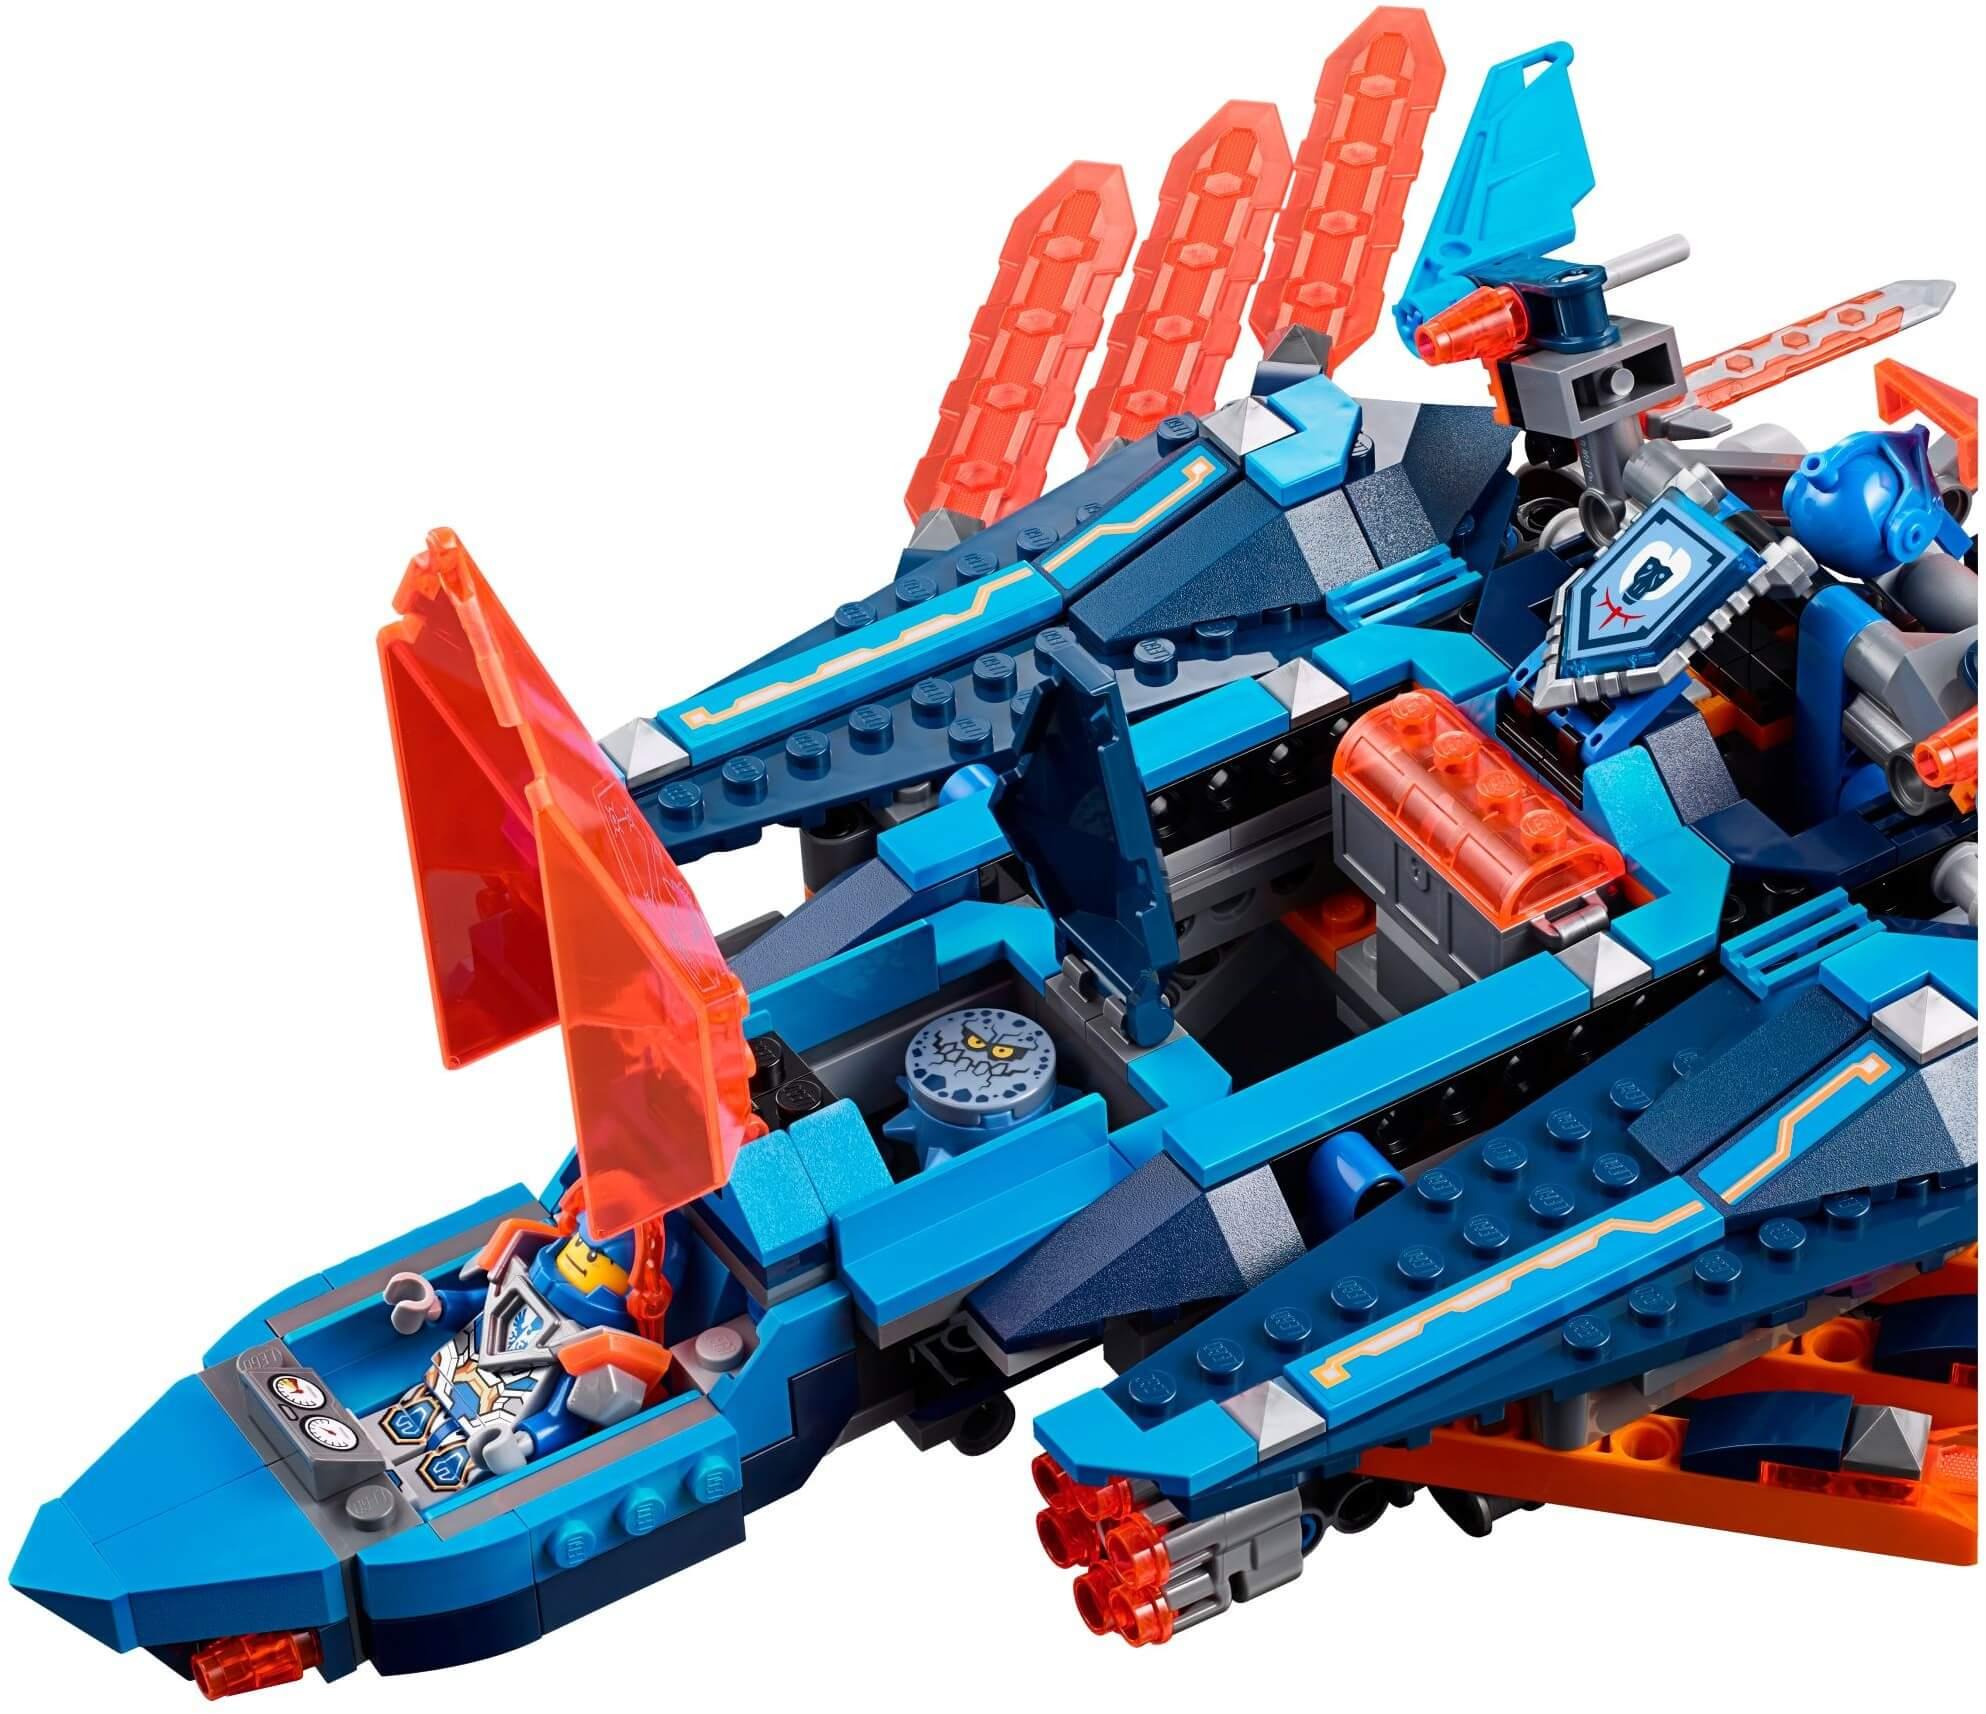 Mua đồ chơi LEGO 70351 - LEGO Nexo Knights 70351 - Phi Thuyền Chim Ưng của Clay (LEGO 70351 Clay's Falcon Fighter Blaster)